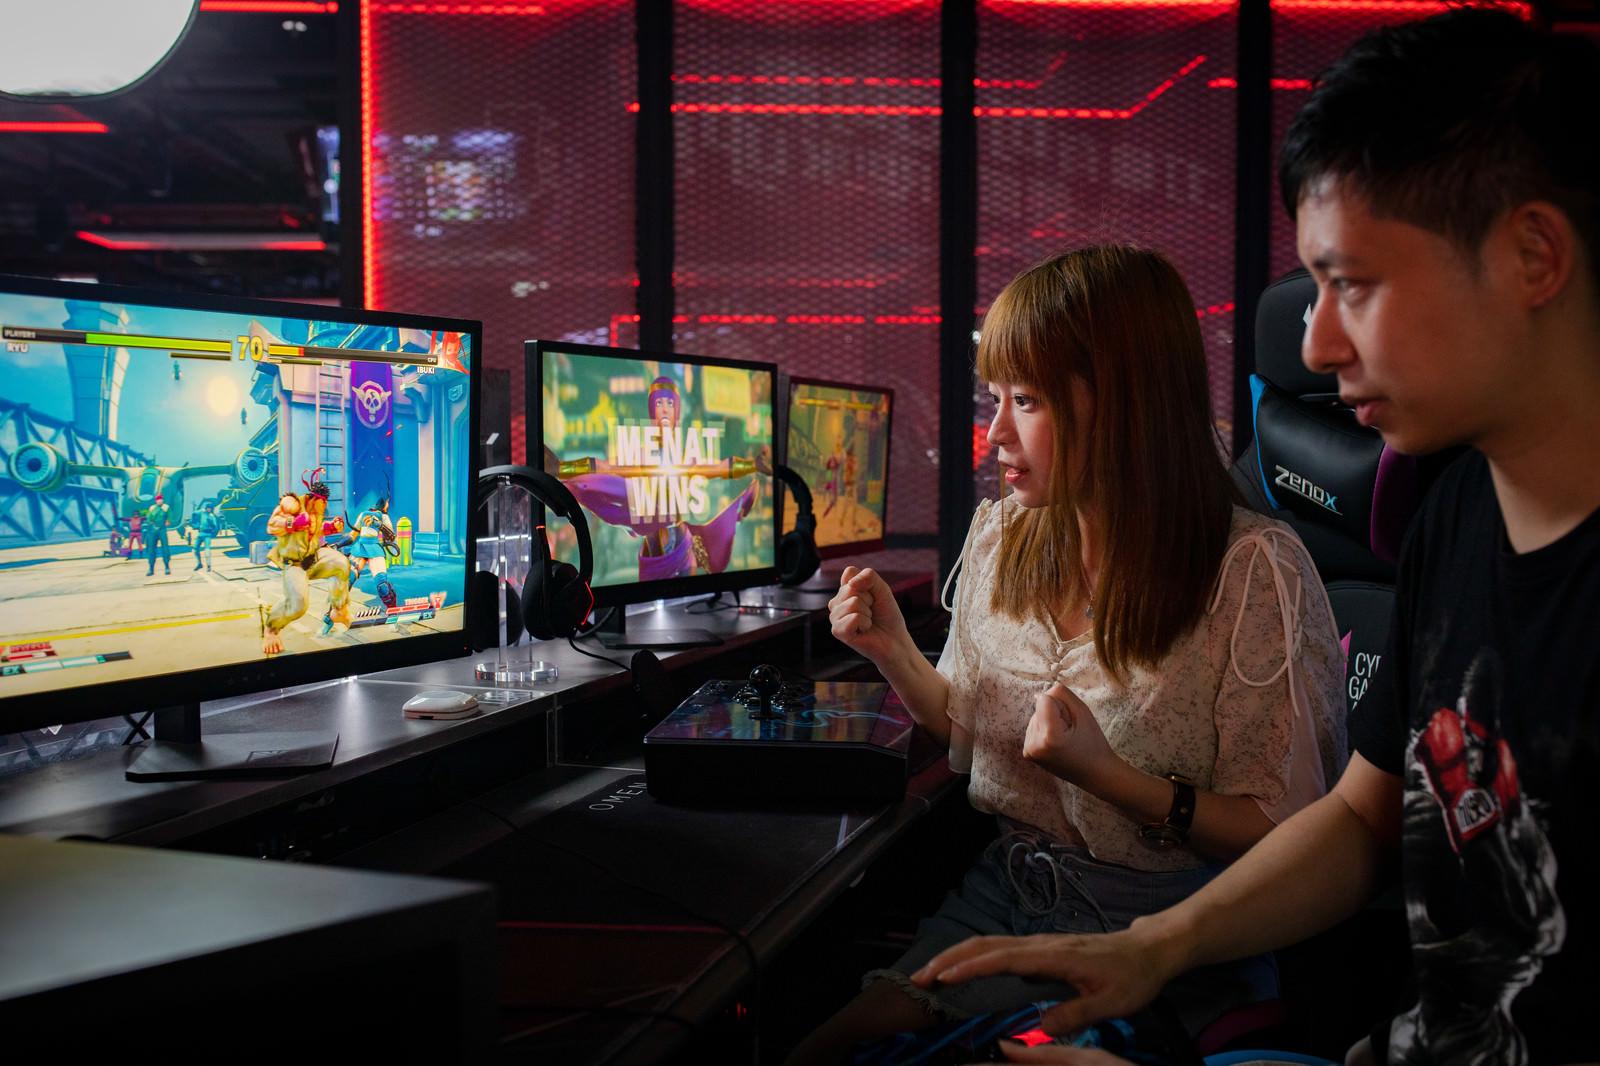 「eスポーツ施設で2D格闘ゲームをプレイする男女カップル - ストリートファイターV」の写真[モデル:Humanbomb まめち]